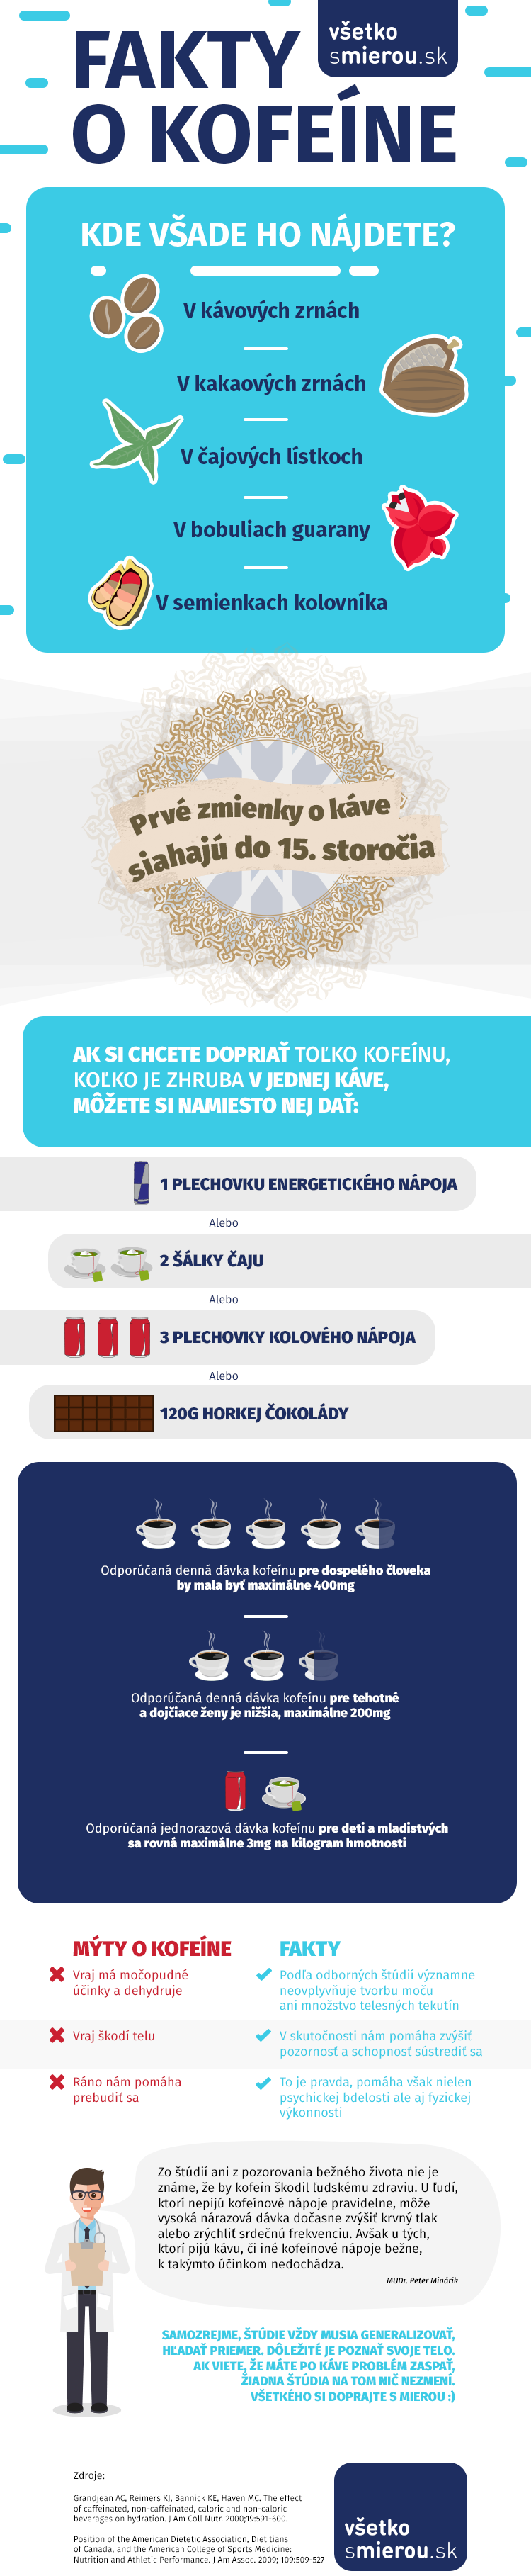 infografika o kofeine